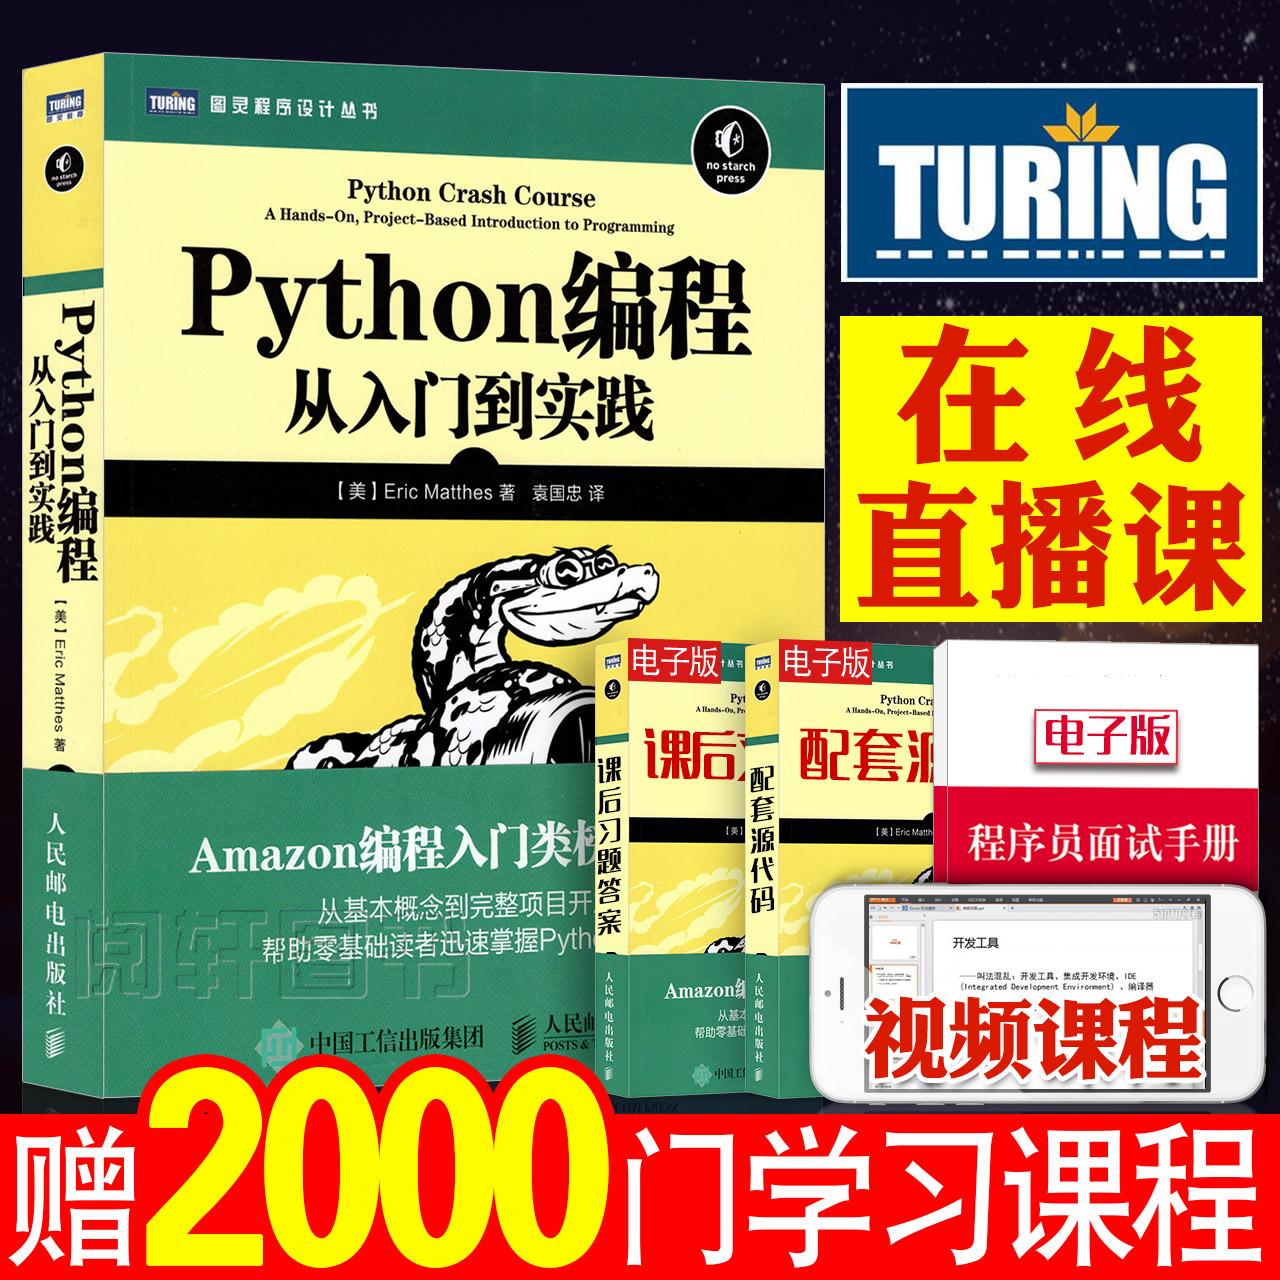 python基础教程 零基础学python3.5编程从入门到实践 精通计算机程序设计pathon核心技术网络爬虫书籍 赠源代码/视频课程小甲鱼